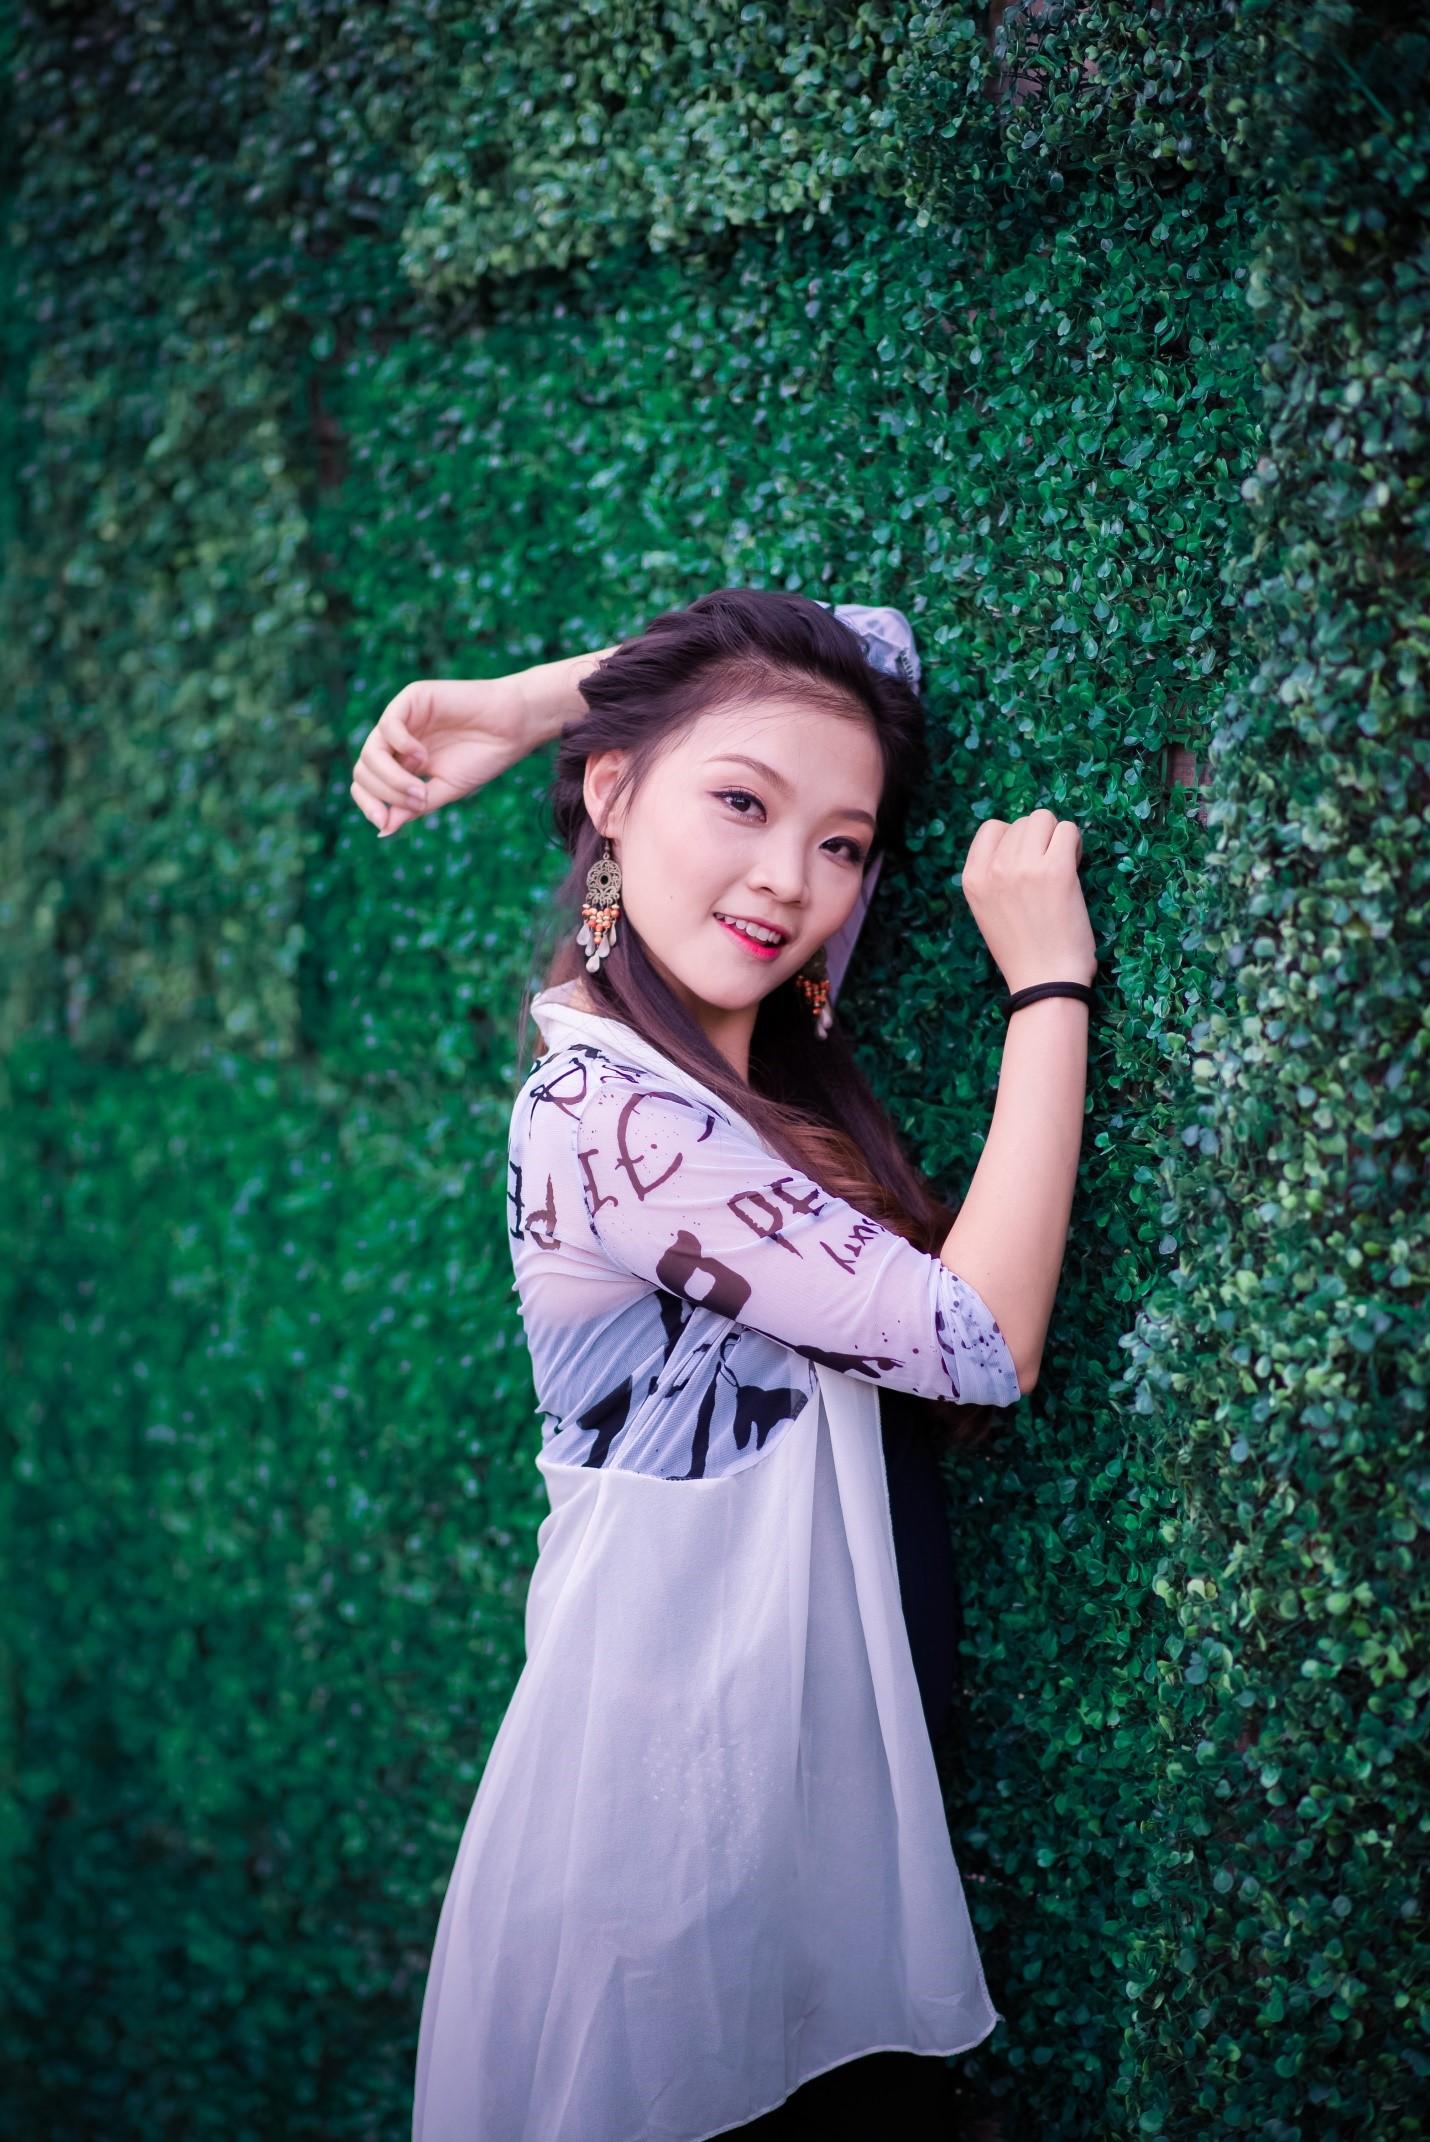 Tran Ngoc Bao